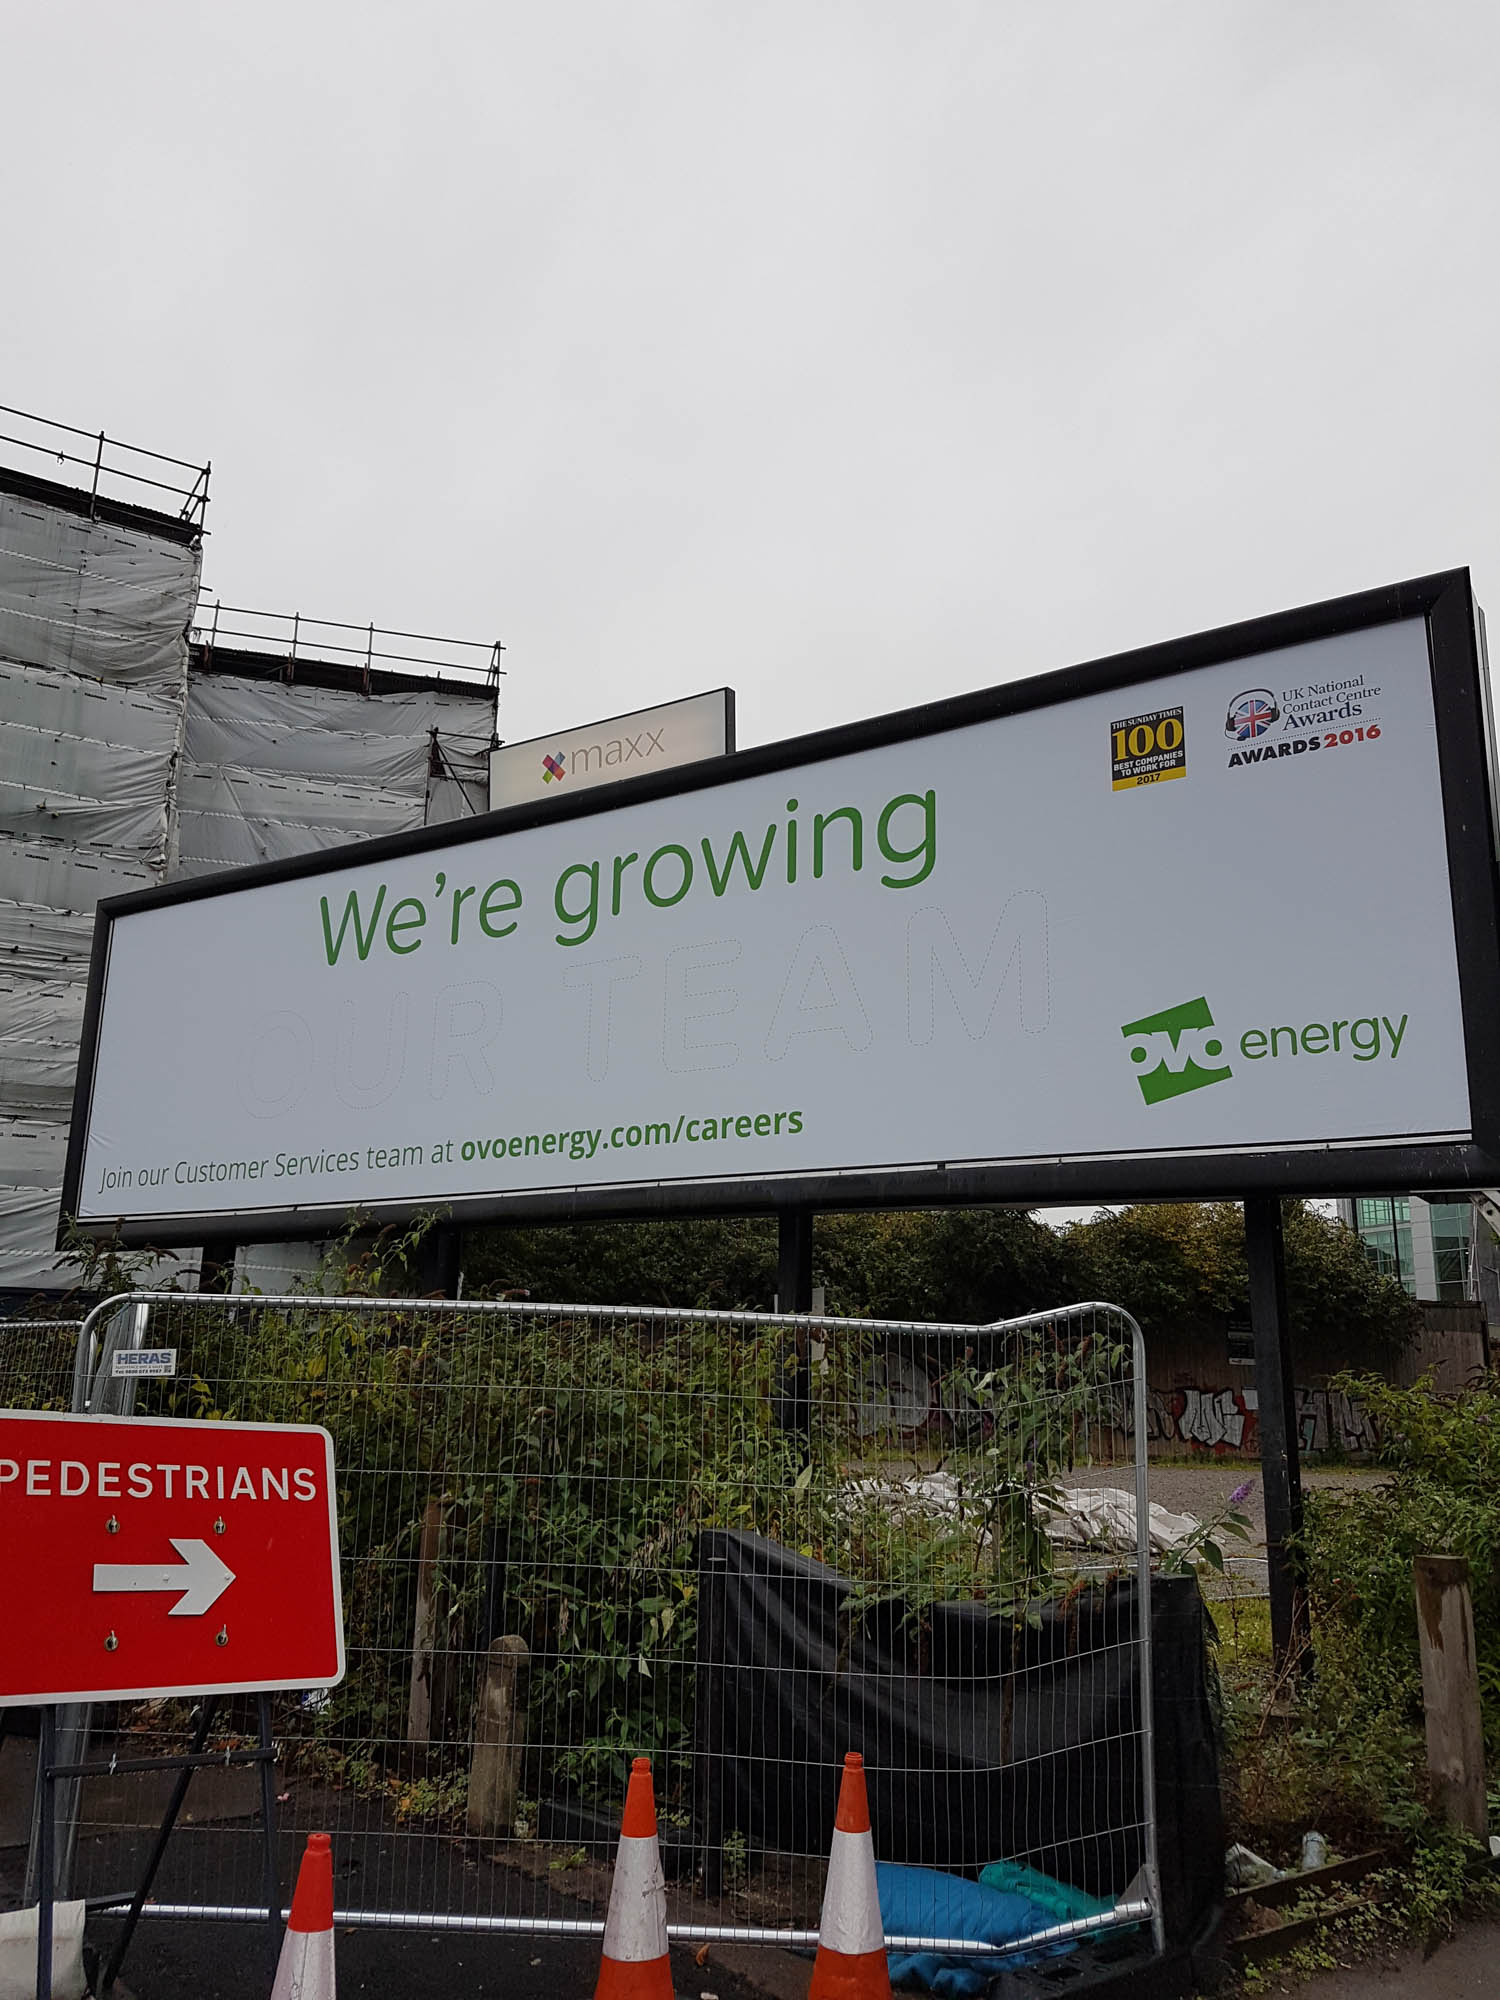 thirty-three-exterior-plant-display-billboard-mosswall-bespoke-custom-bristol-plantcare-ovo-energy-image-1